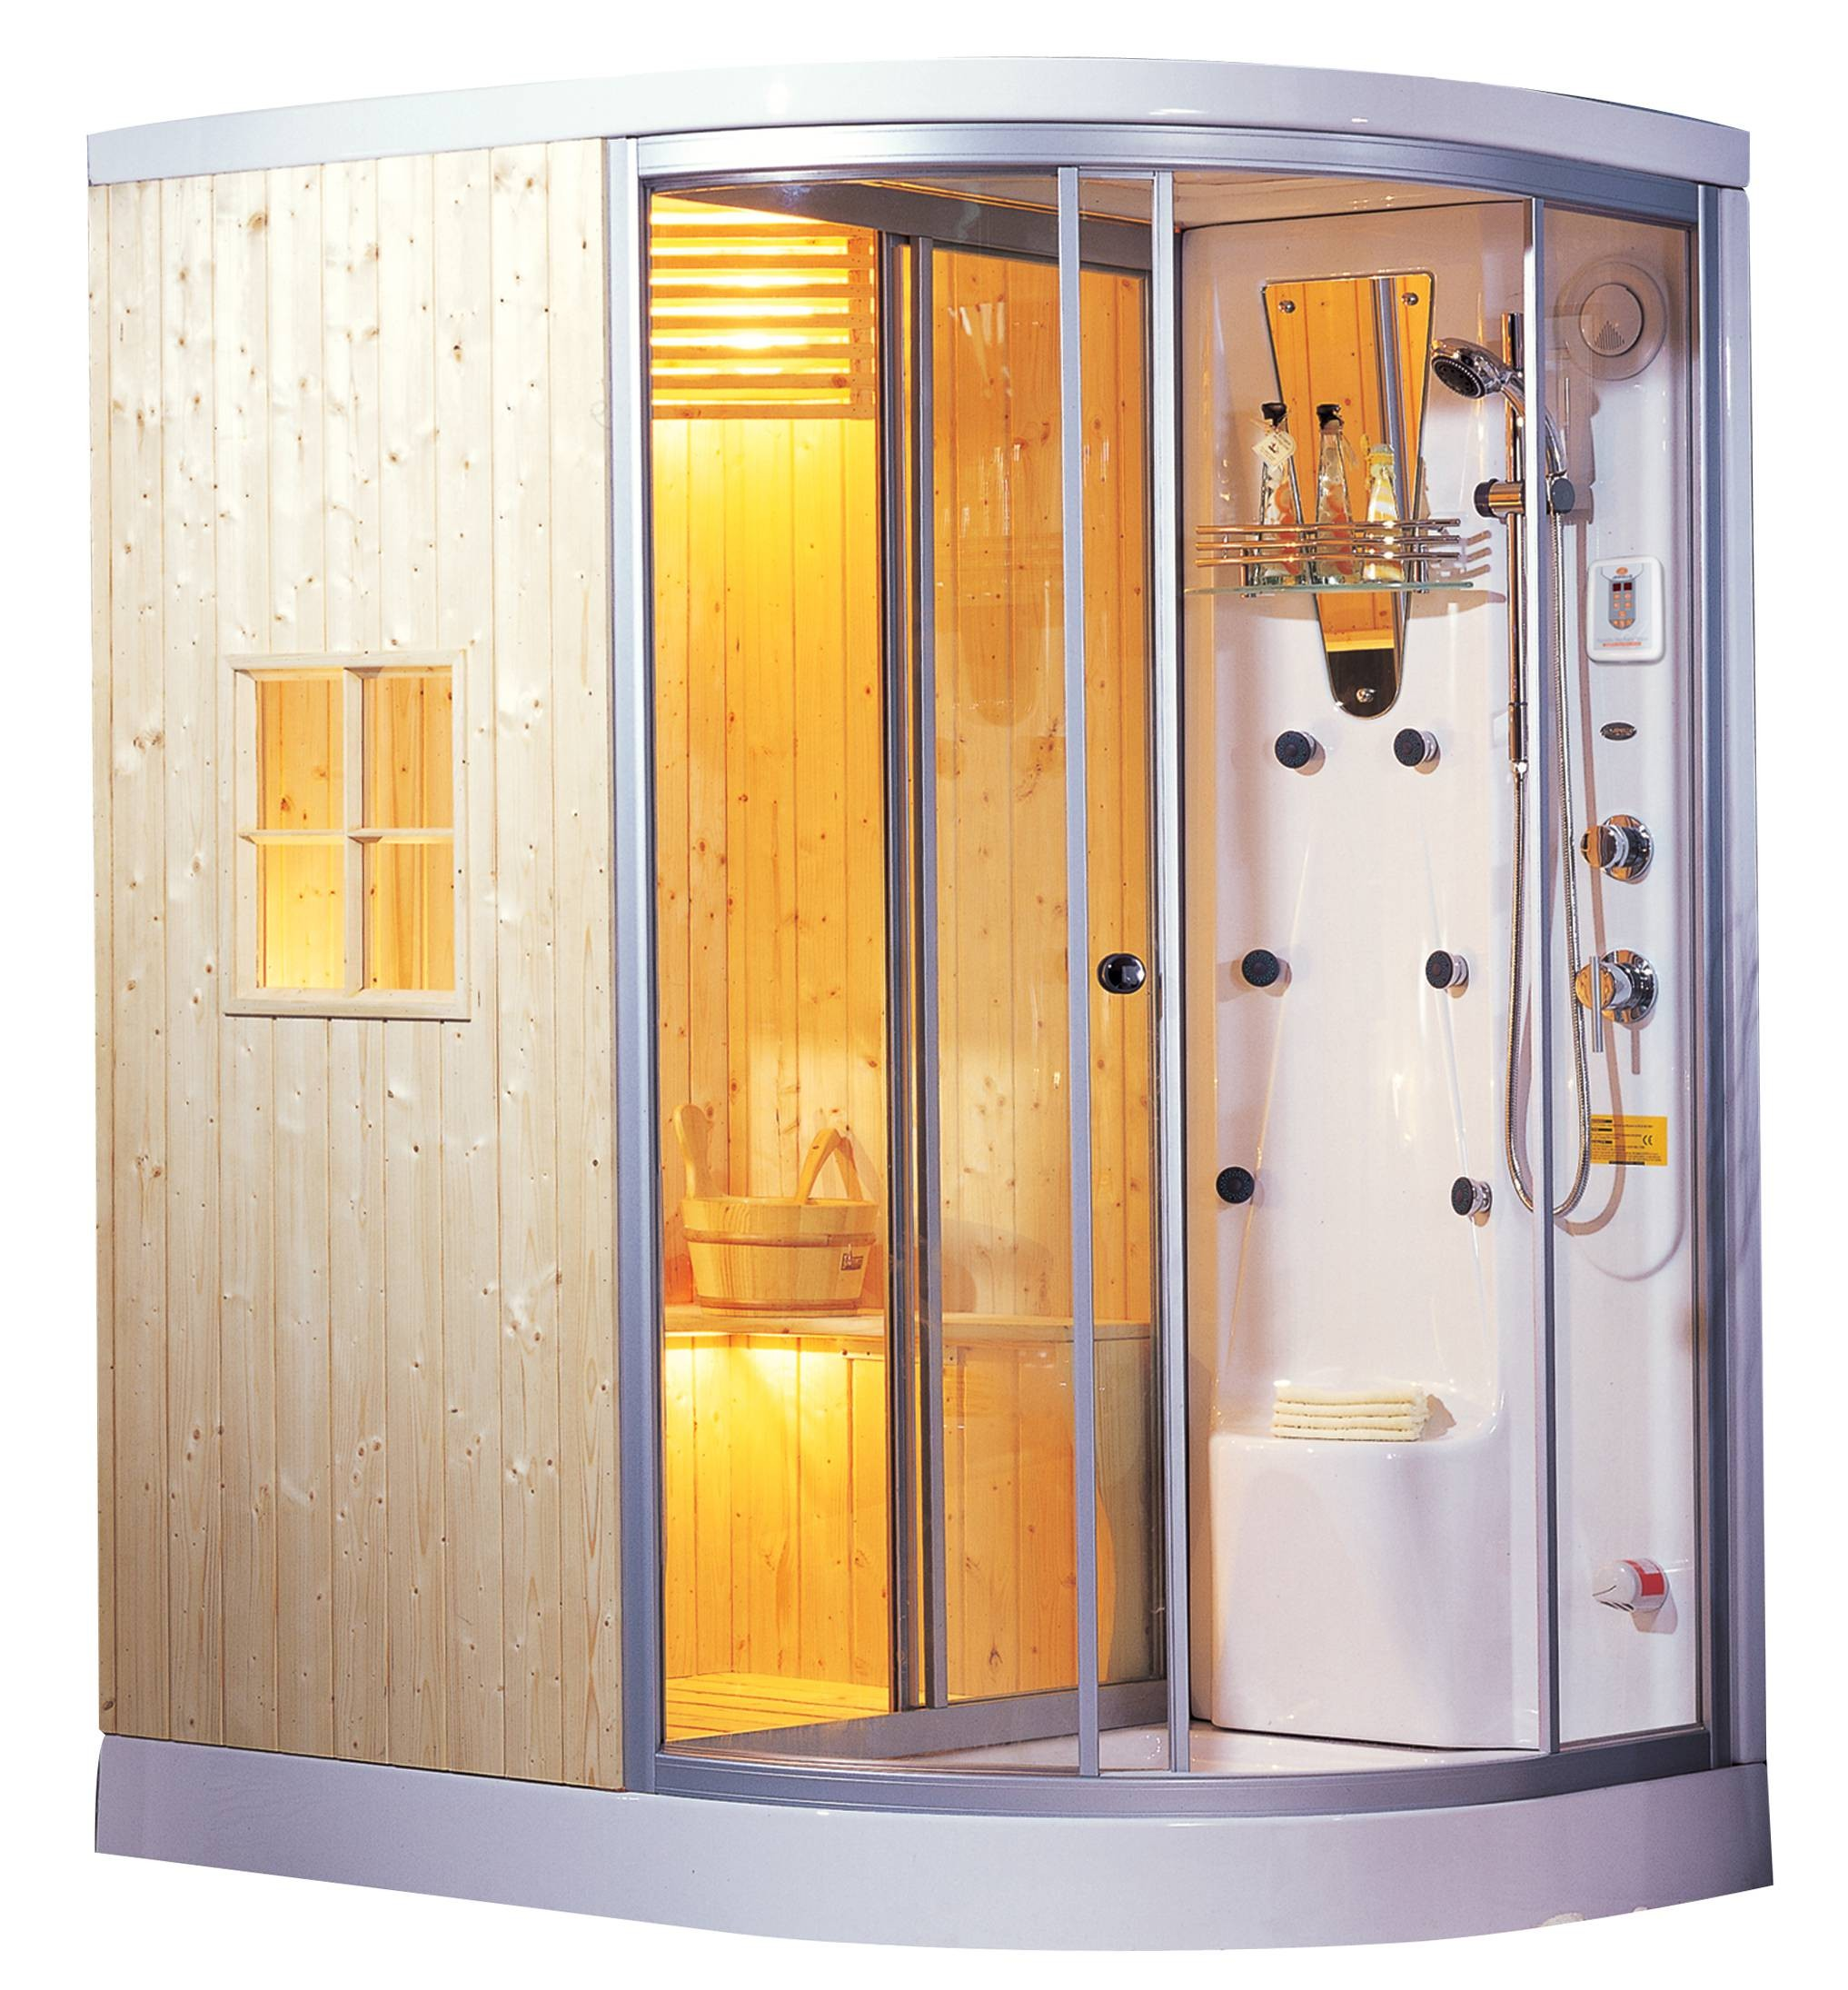 Cabina de sauna y vapor madera natural sellada ag 0201 - Productos para sauna ...